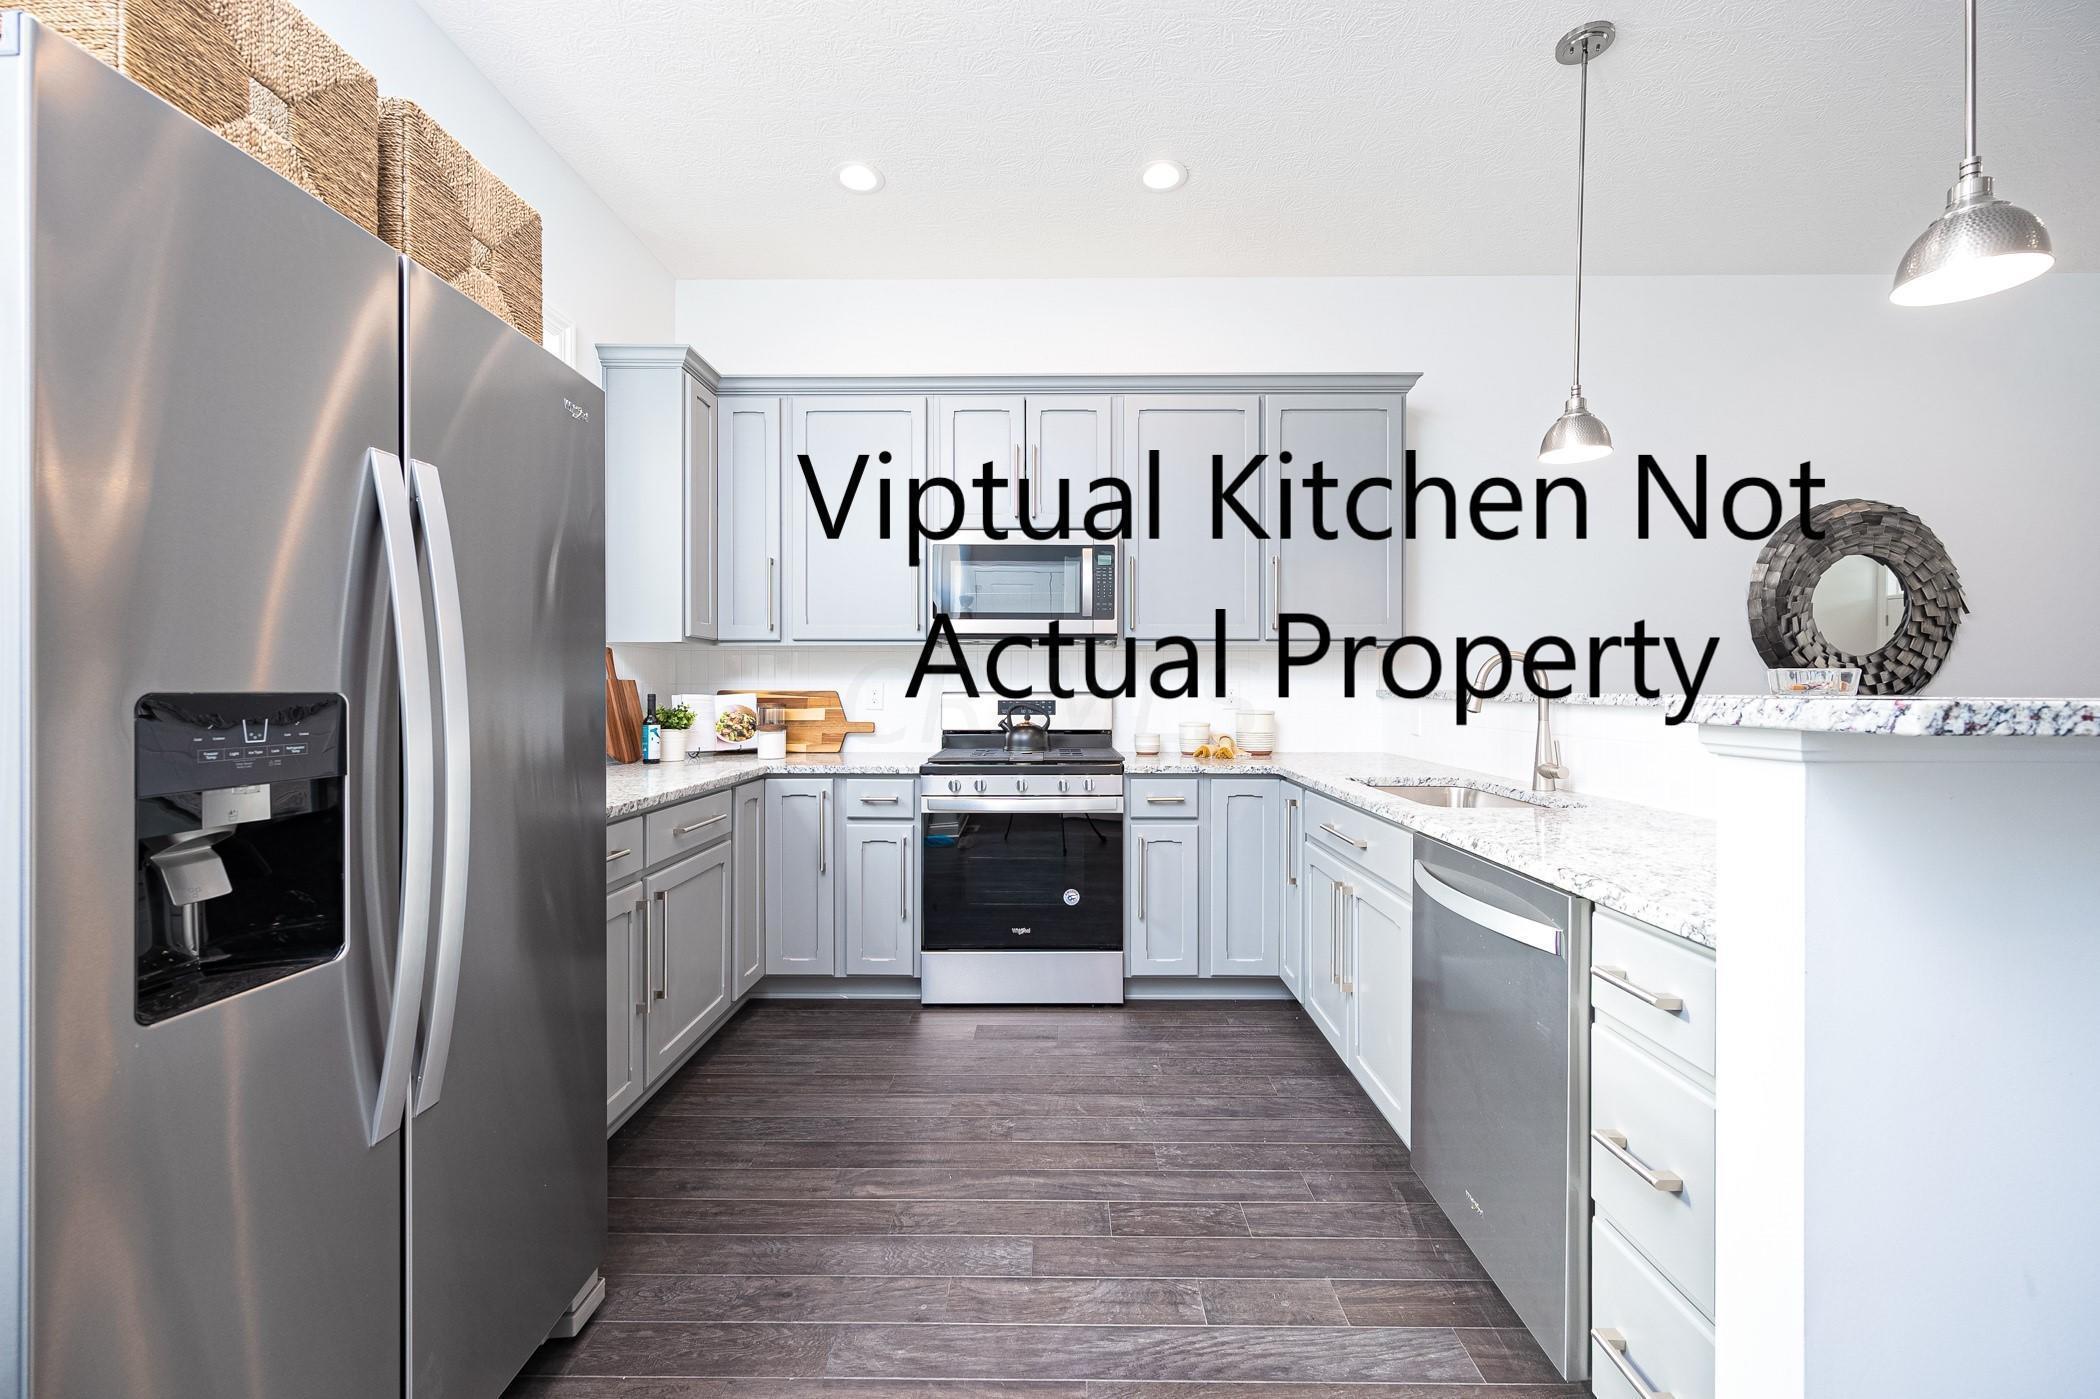 Viptual Kitchen Model